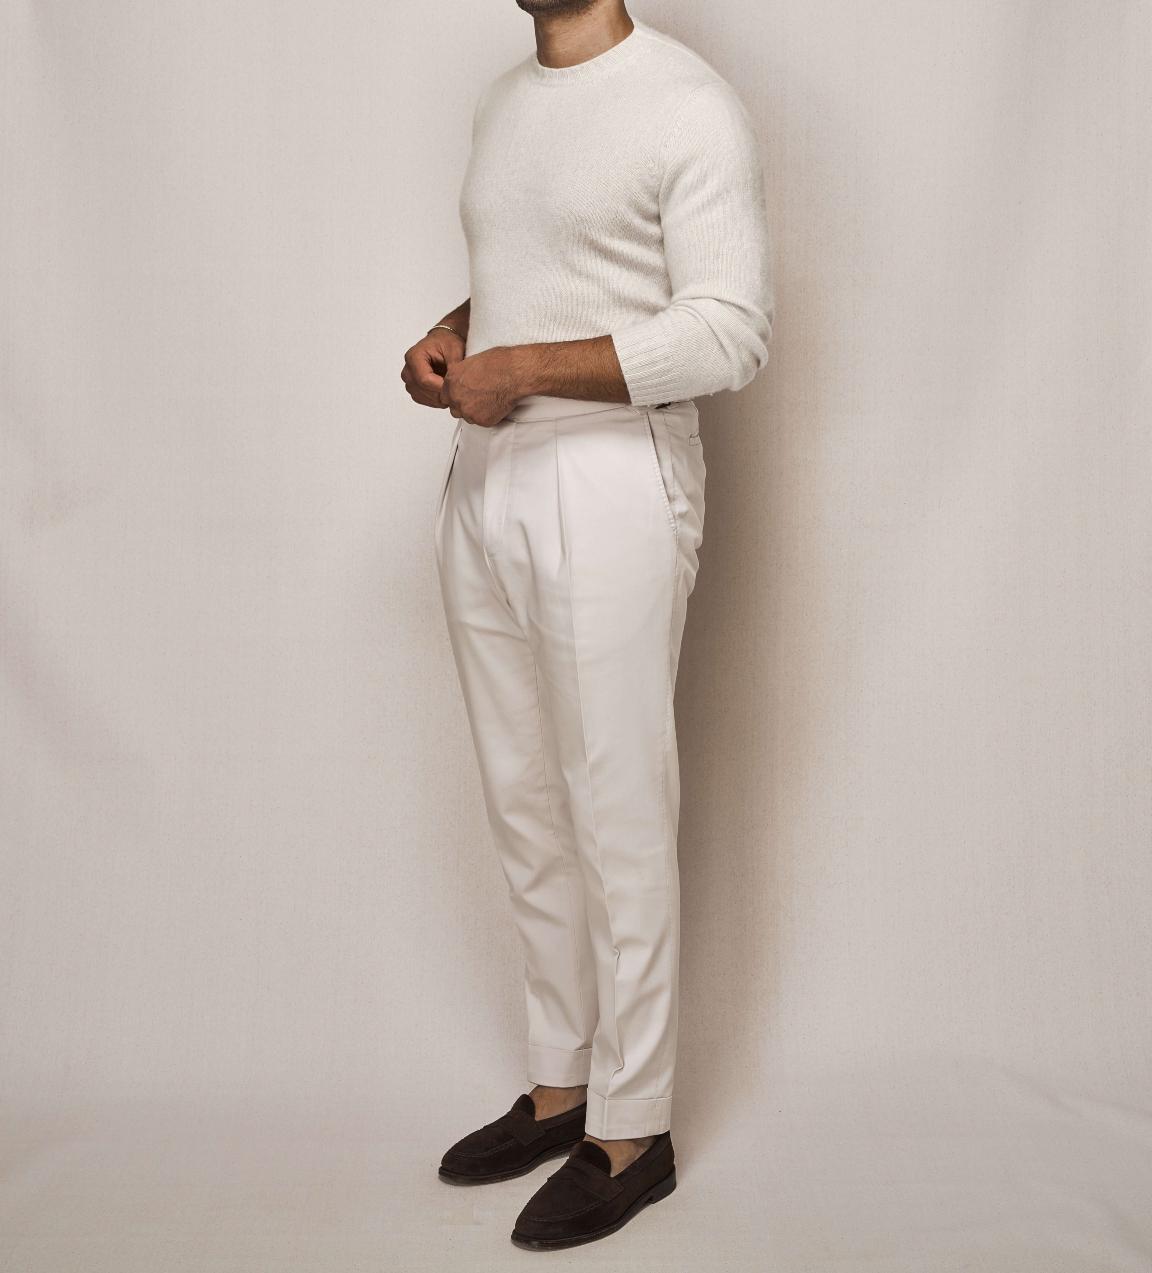 White Cashmere Knit Crew Neck | Cotton Stretch Trouser